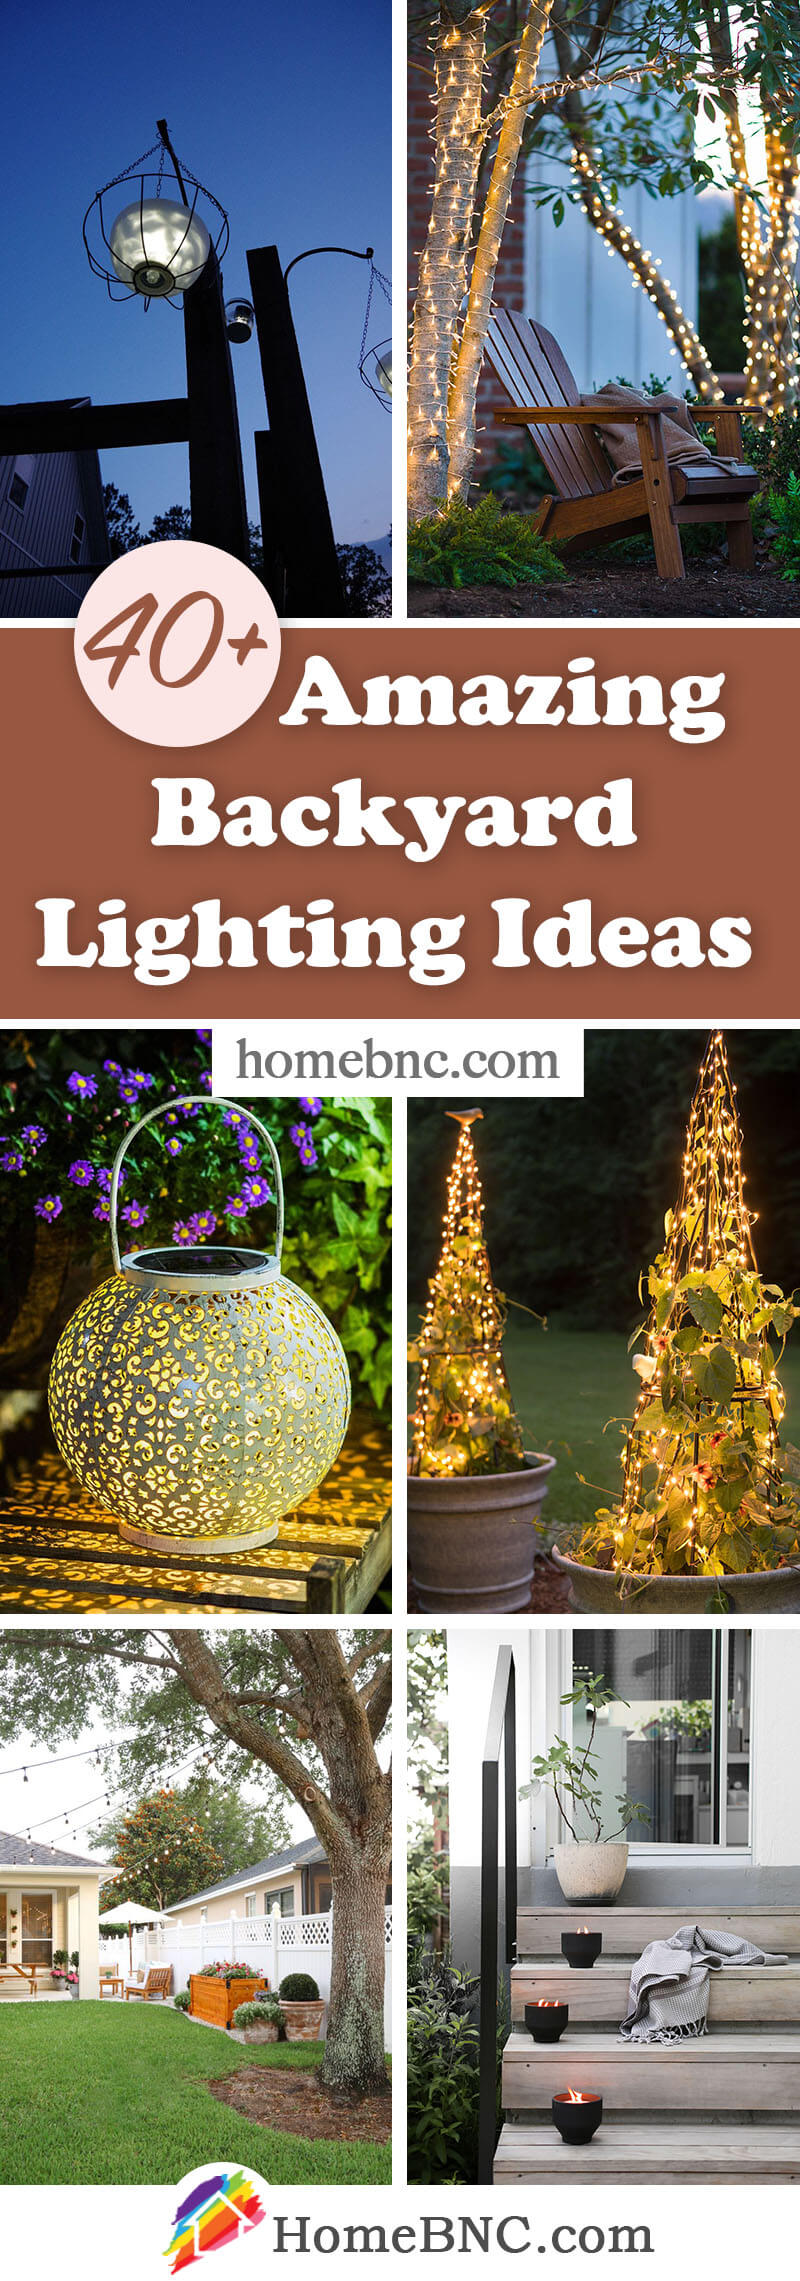 Backyard Lighting Projects